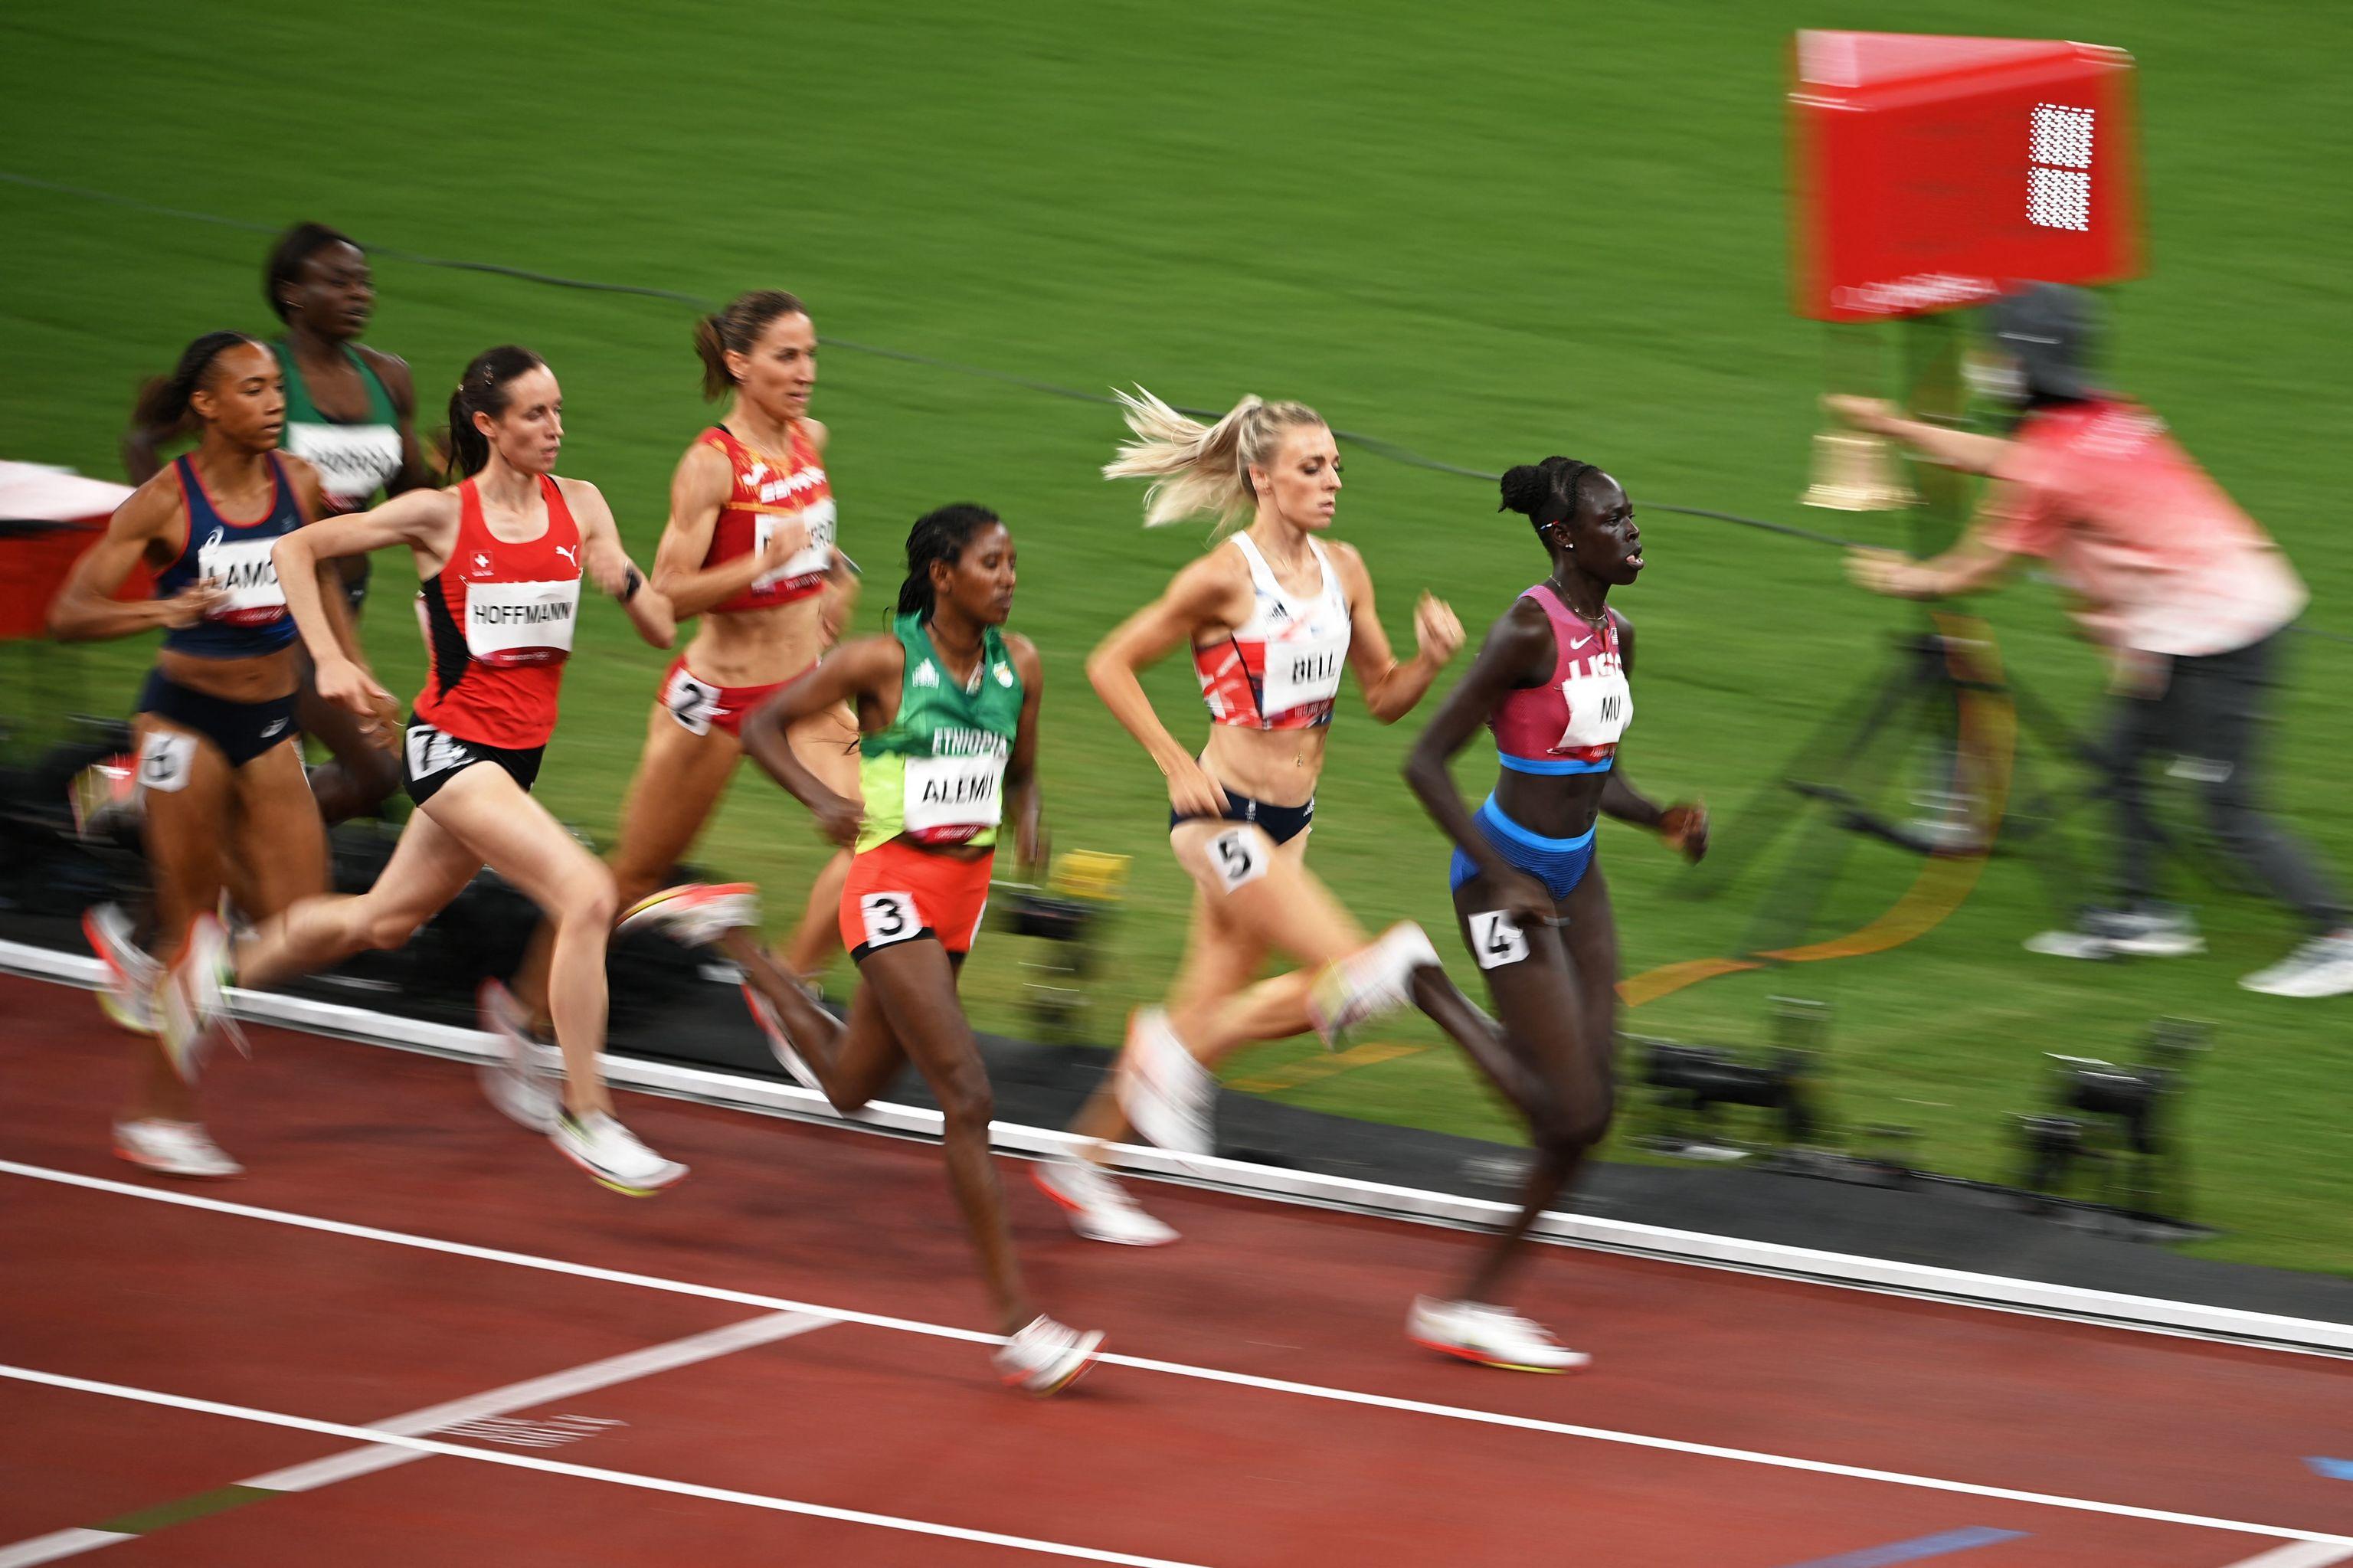 Natalia Romero - atletismo - Juegos Olímpicos 2021 - Tokio 2020